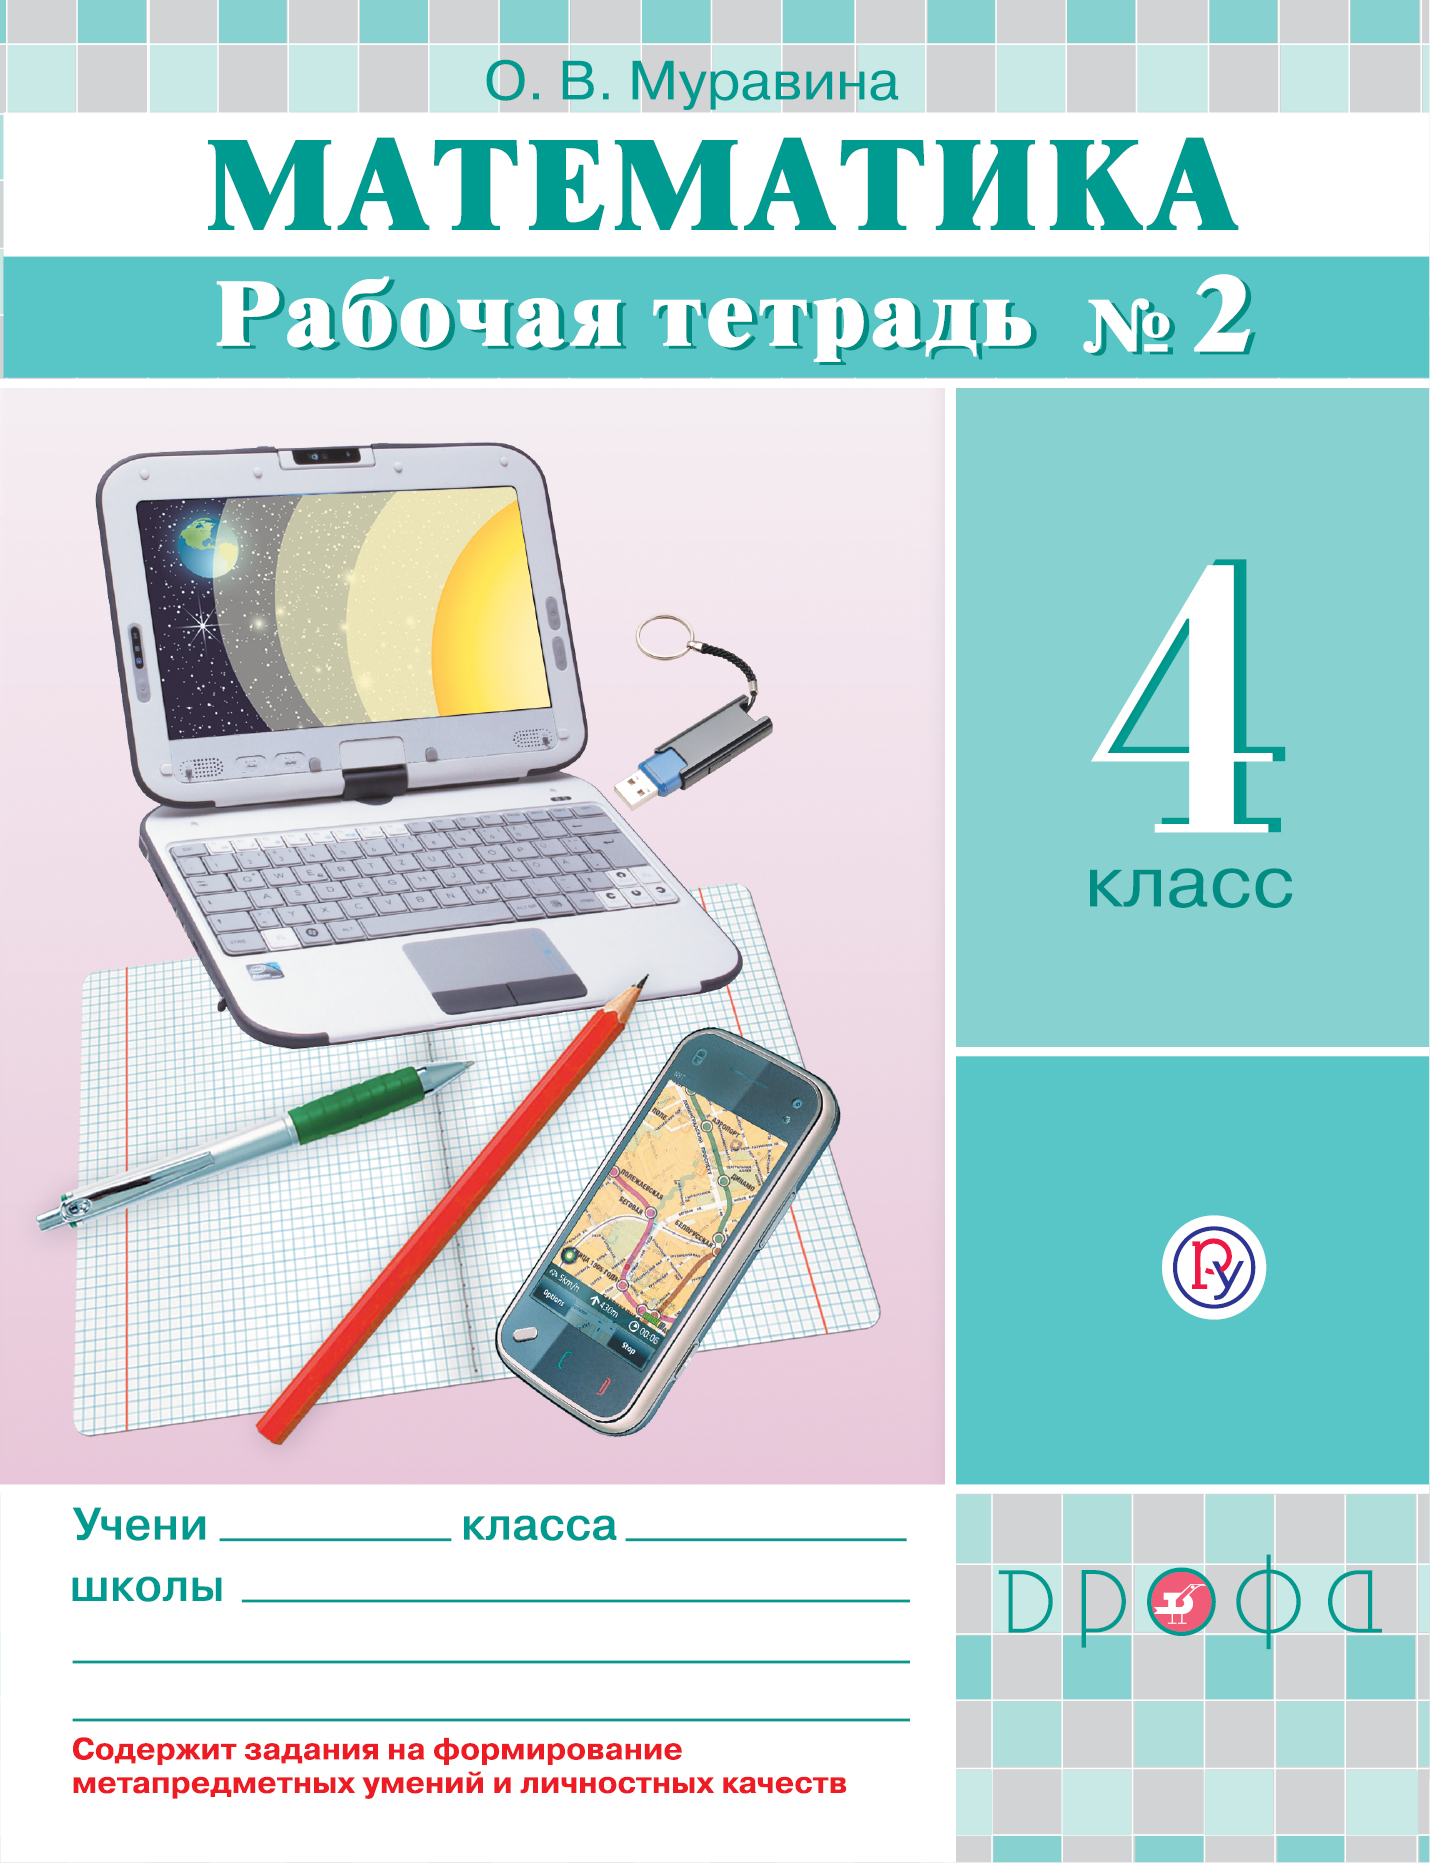 Муравина О.В. Математика. 4 класс. Рабочая тетрадь № 2